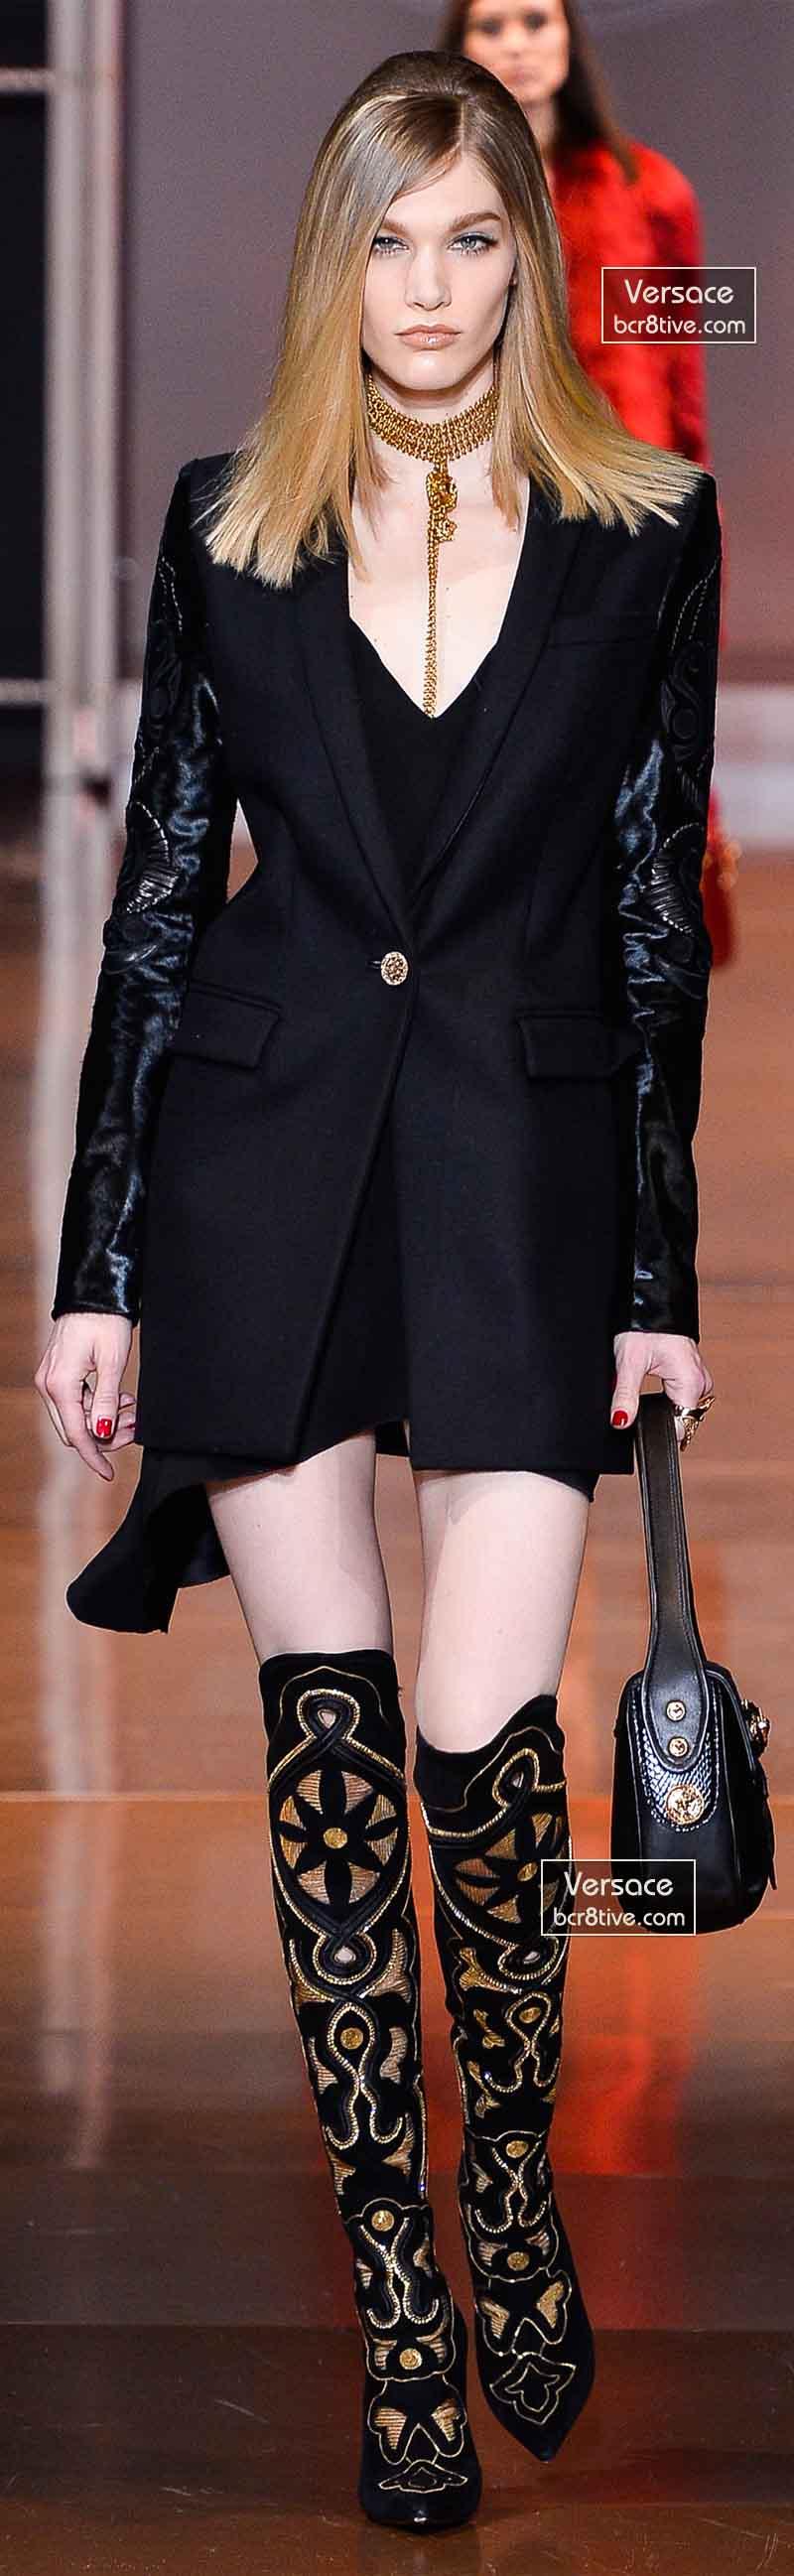 Versace Fall 2014 - Irina Nikolaeva